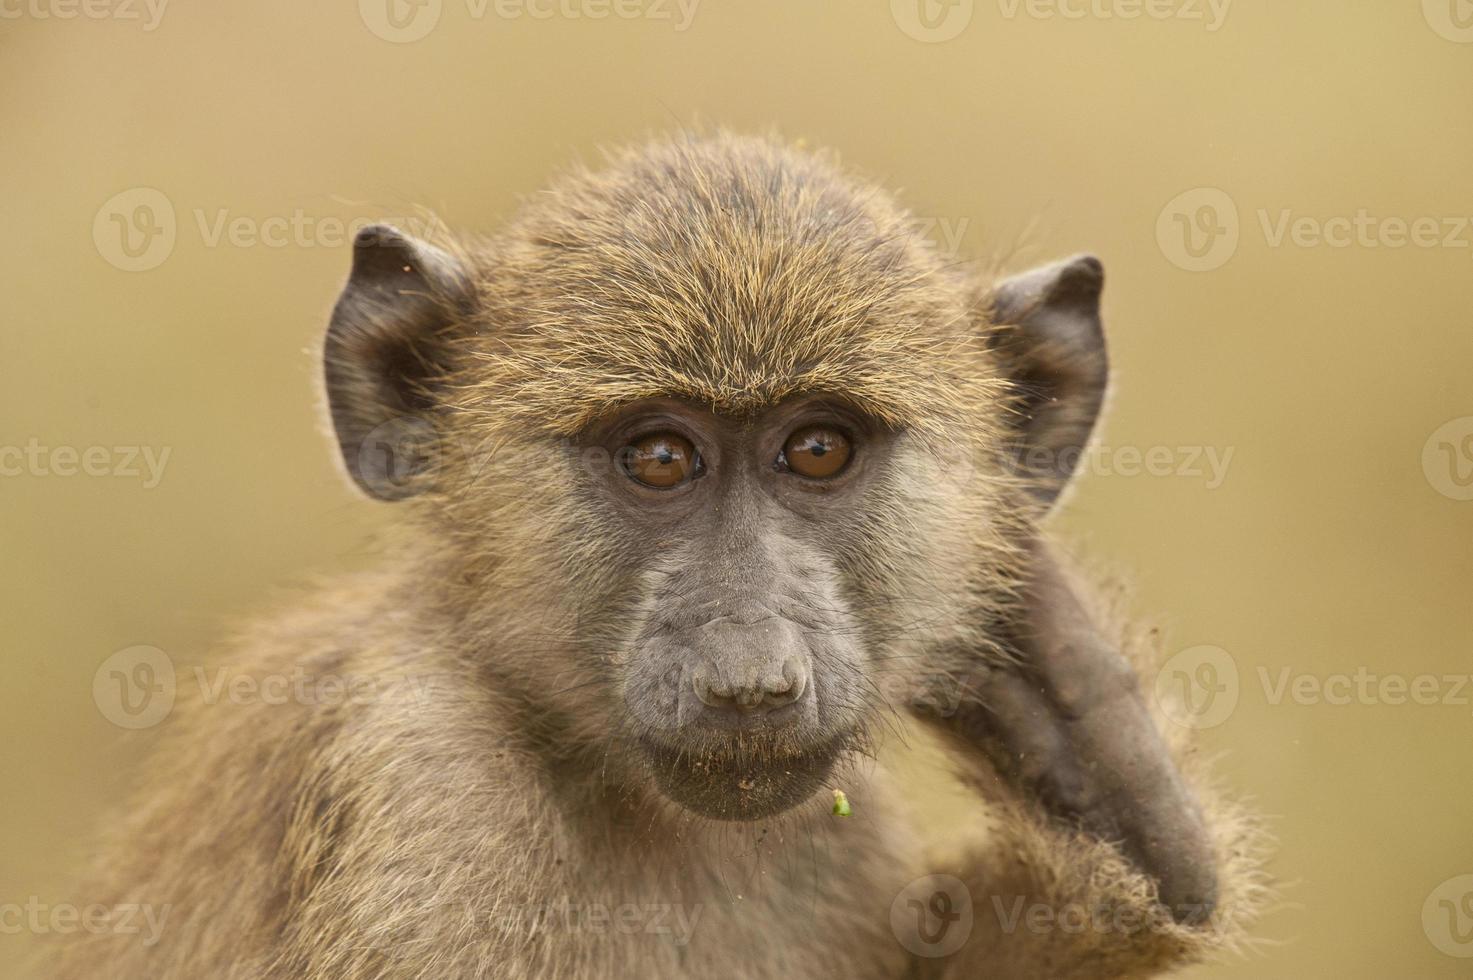 retrato de um babuíno verde-oliva foto